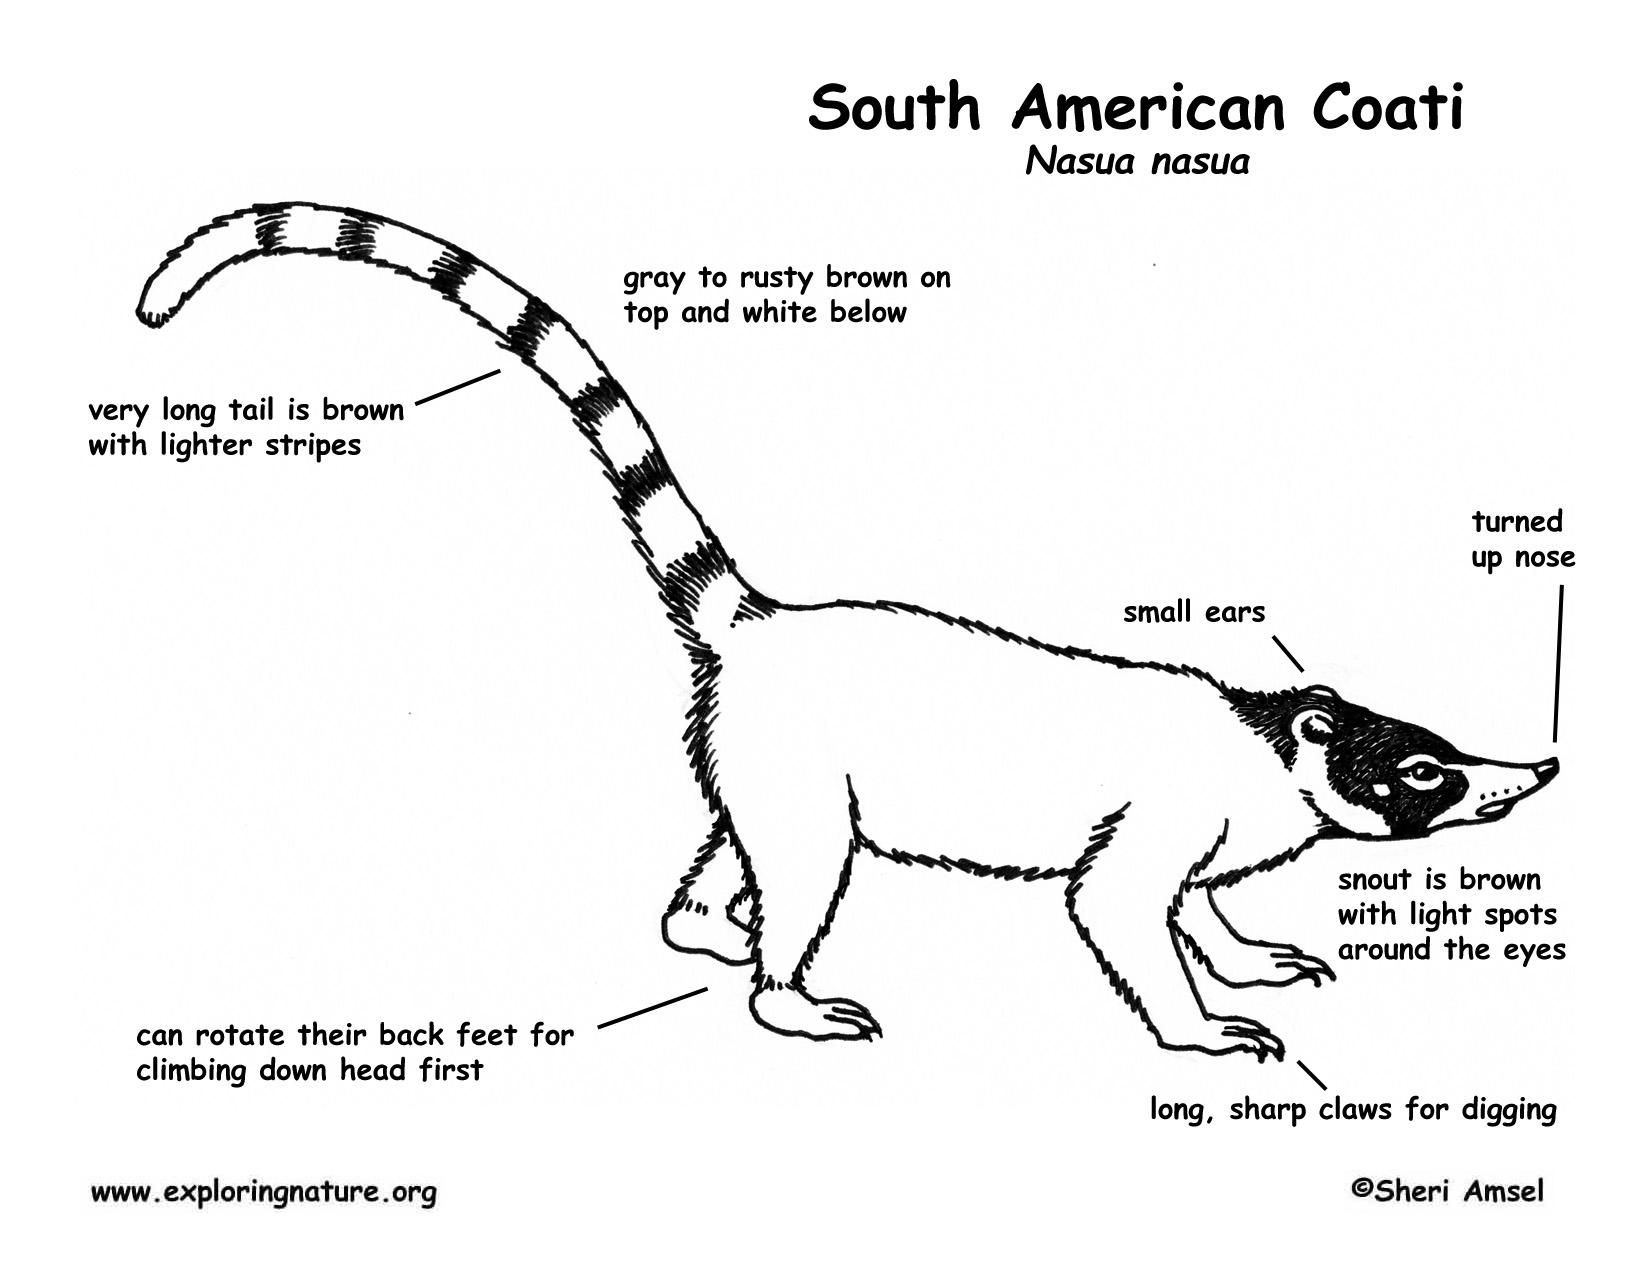 Coati South American